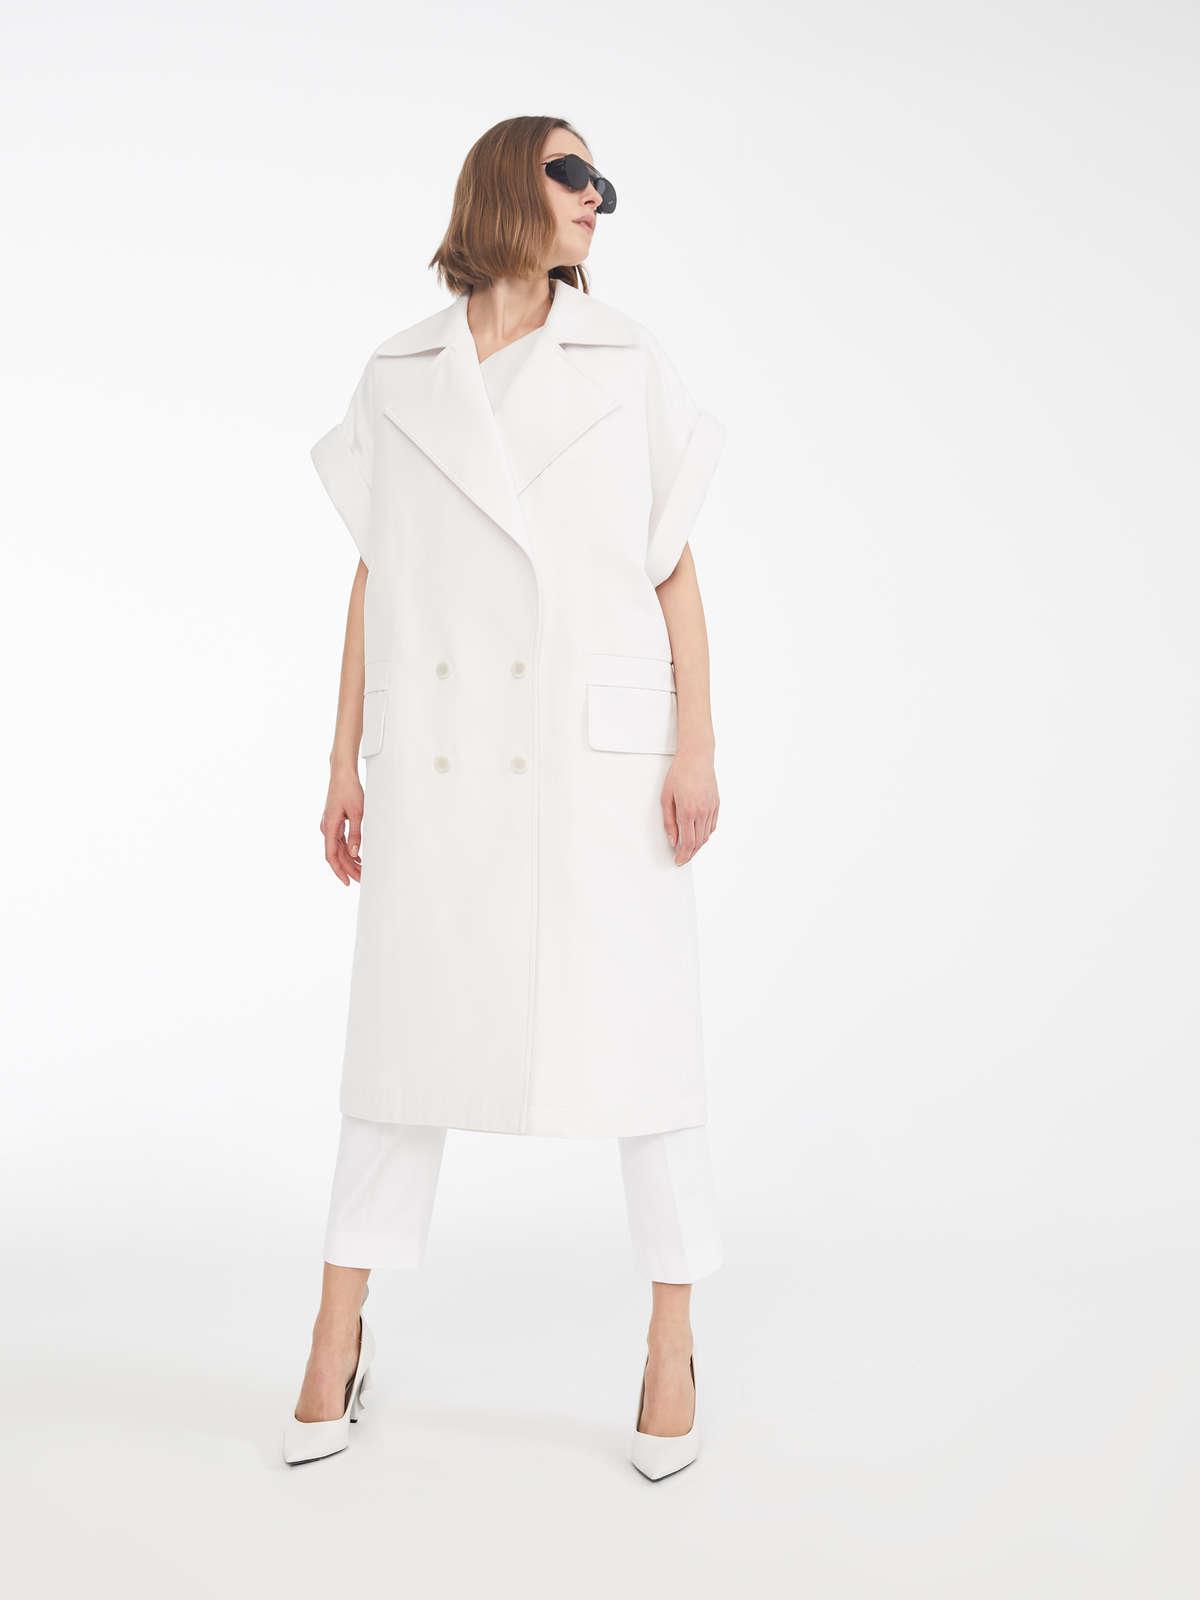 93f59b5b7e3 Women's Coats   New 2019 Collection   Max Mara